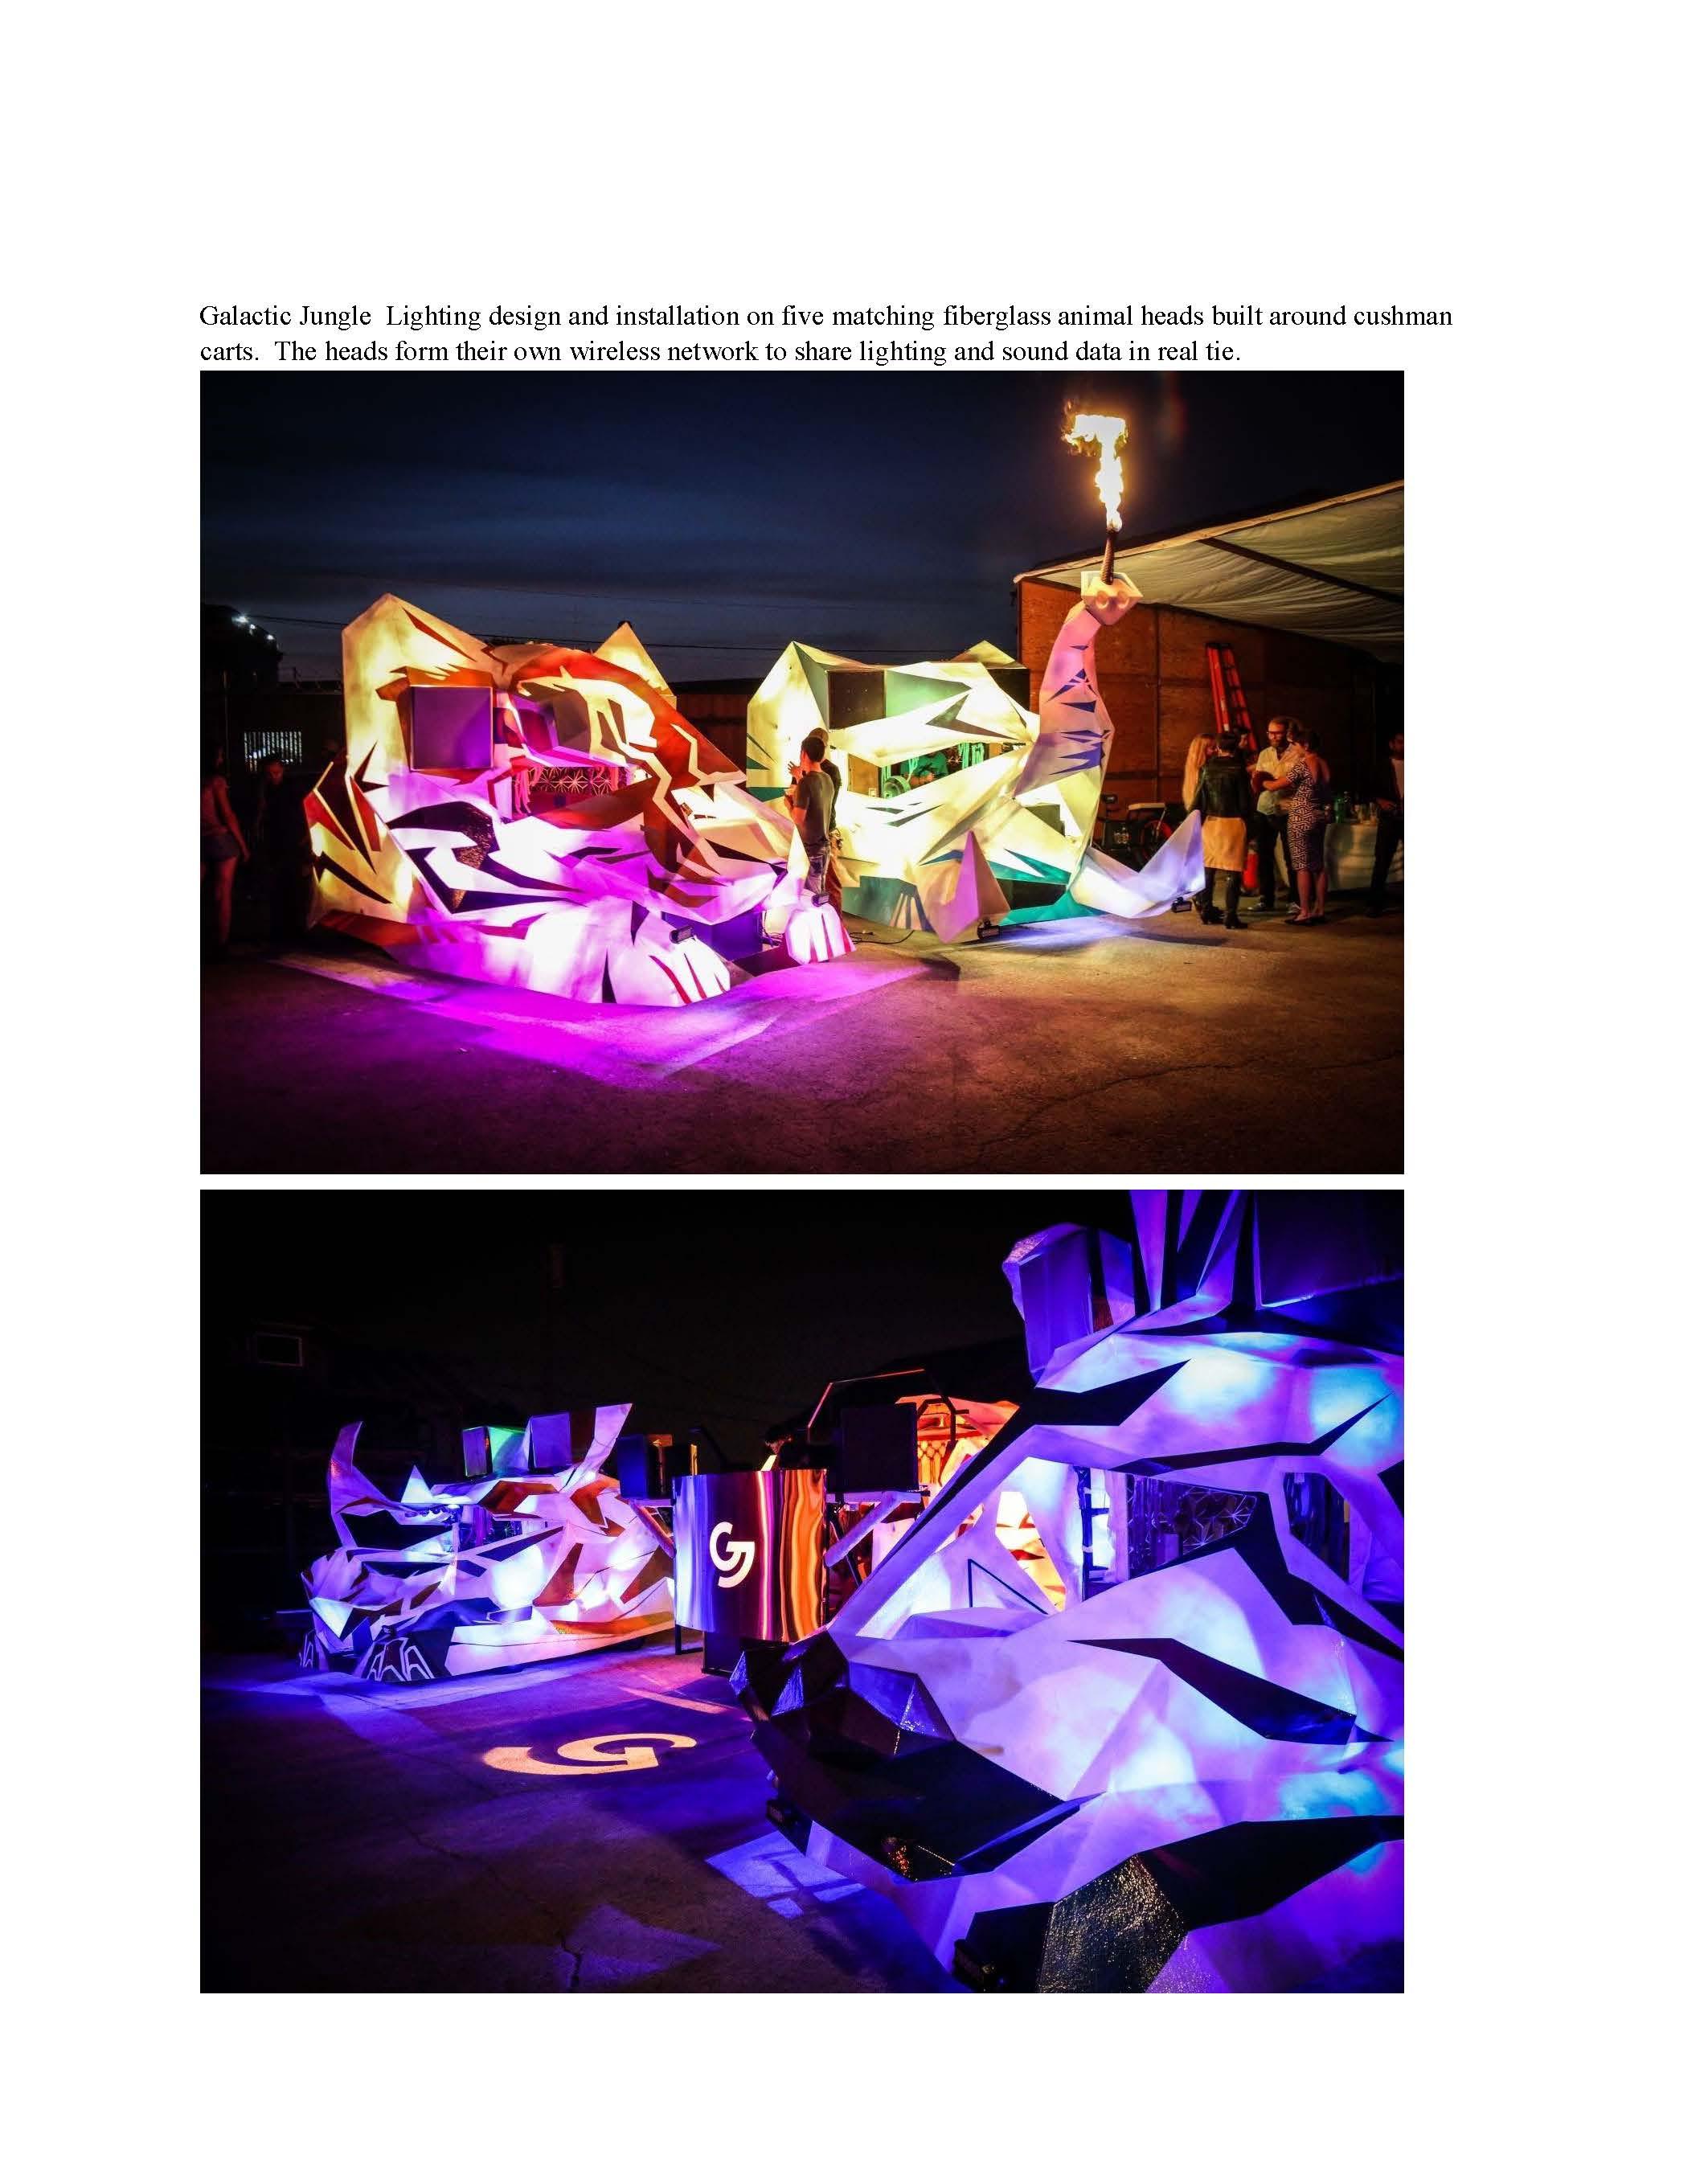 randys porfolio for slideshow_Page_03.jpg